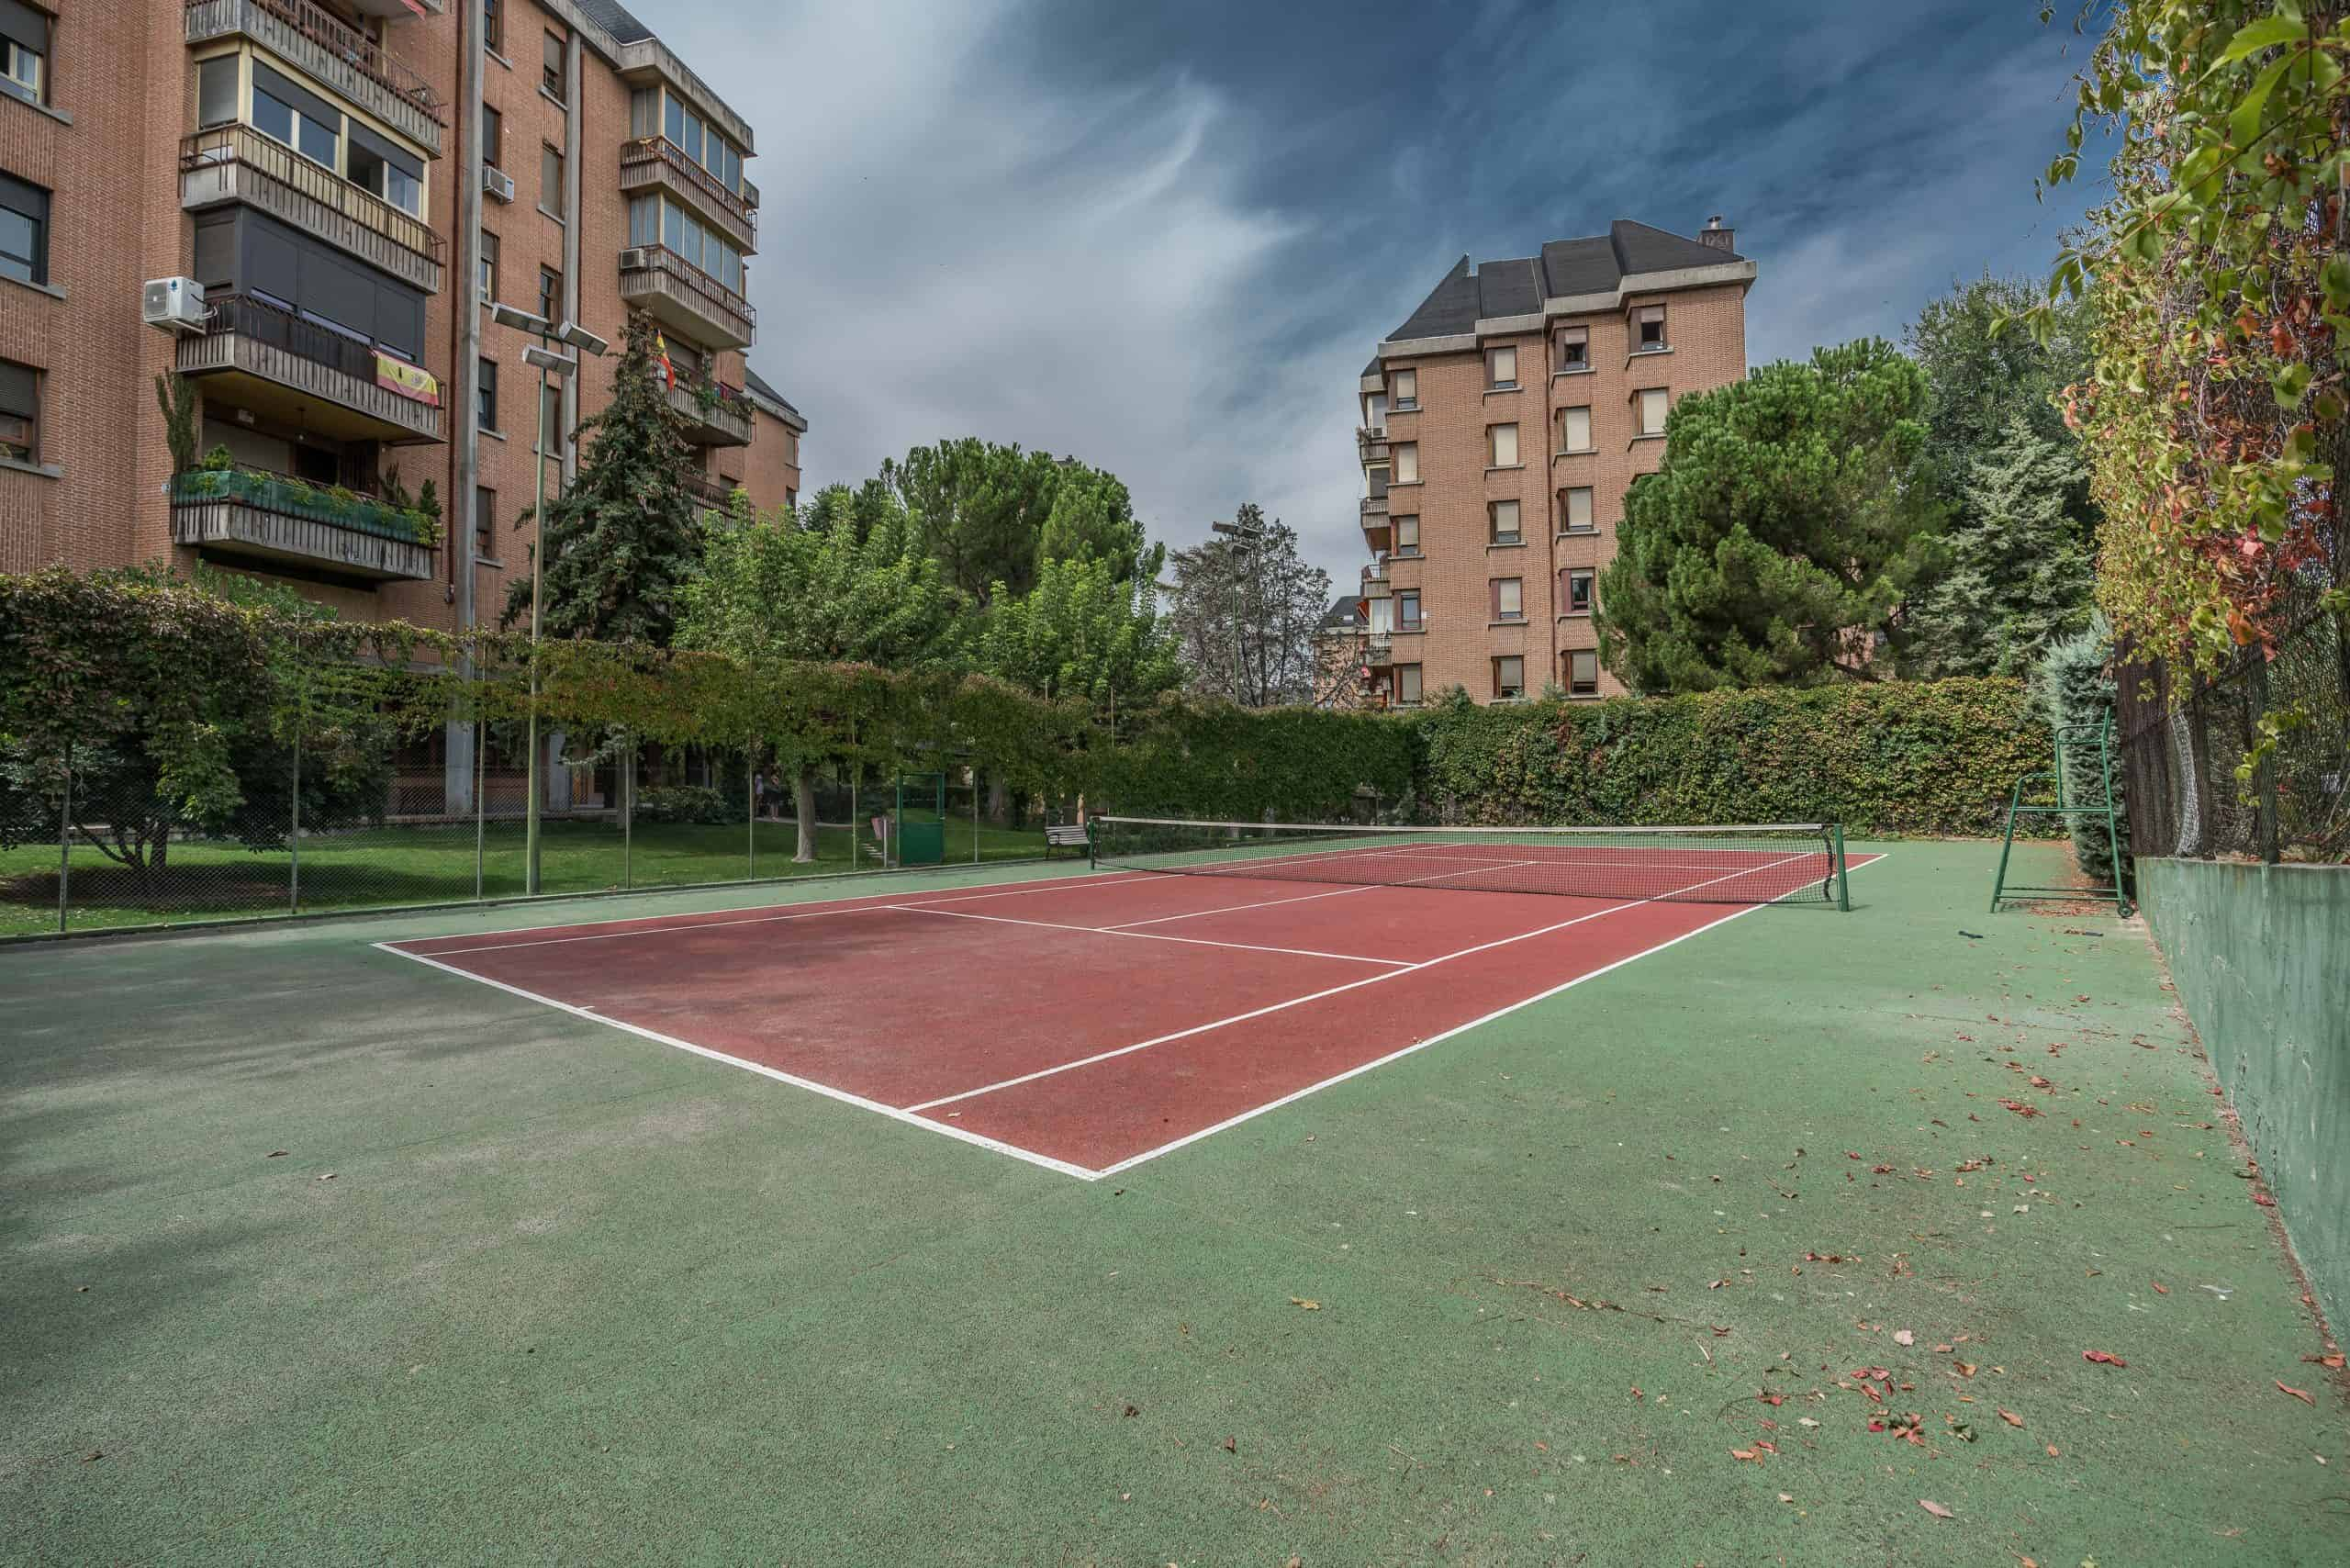 Agencia Inmobiliaria de Madrid-FUTUROCASA-Zona ARGANZUELA-EMBAJADORES-LEGAZPI -calle Embajadores- baño 163